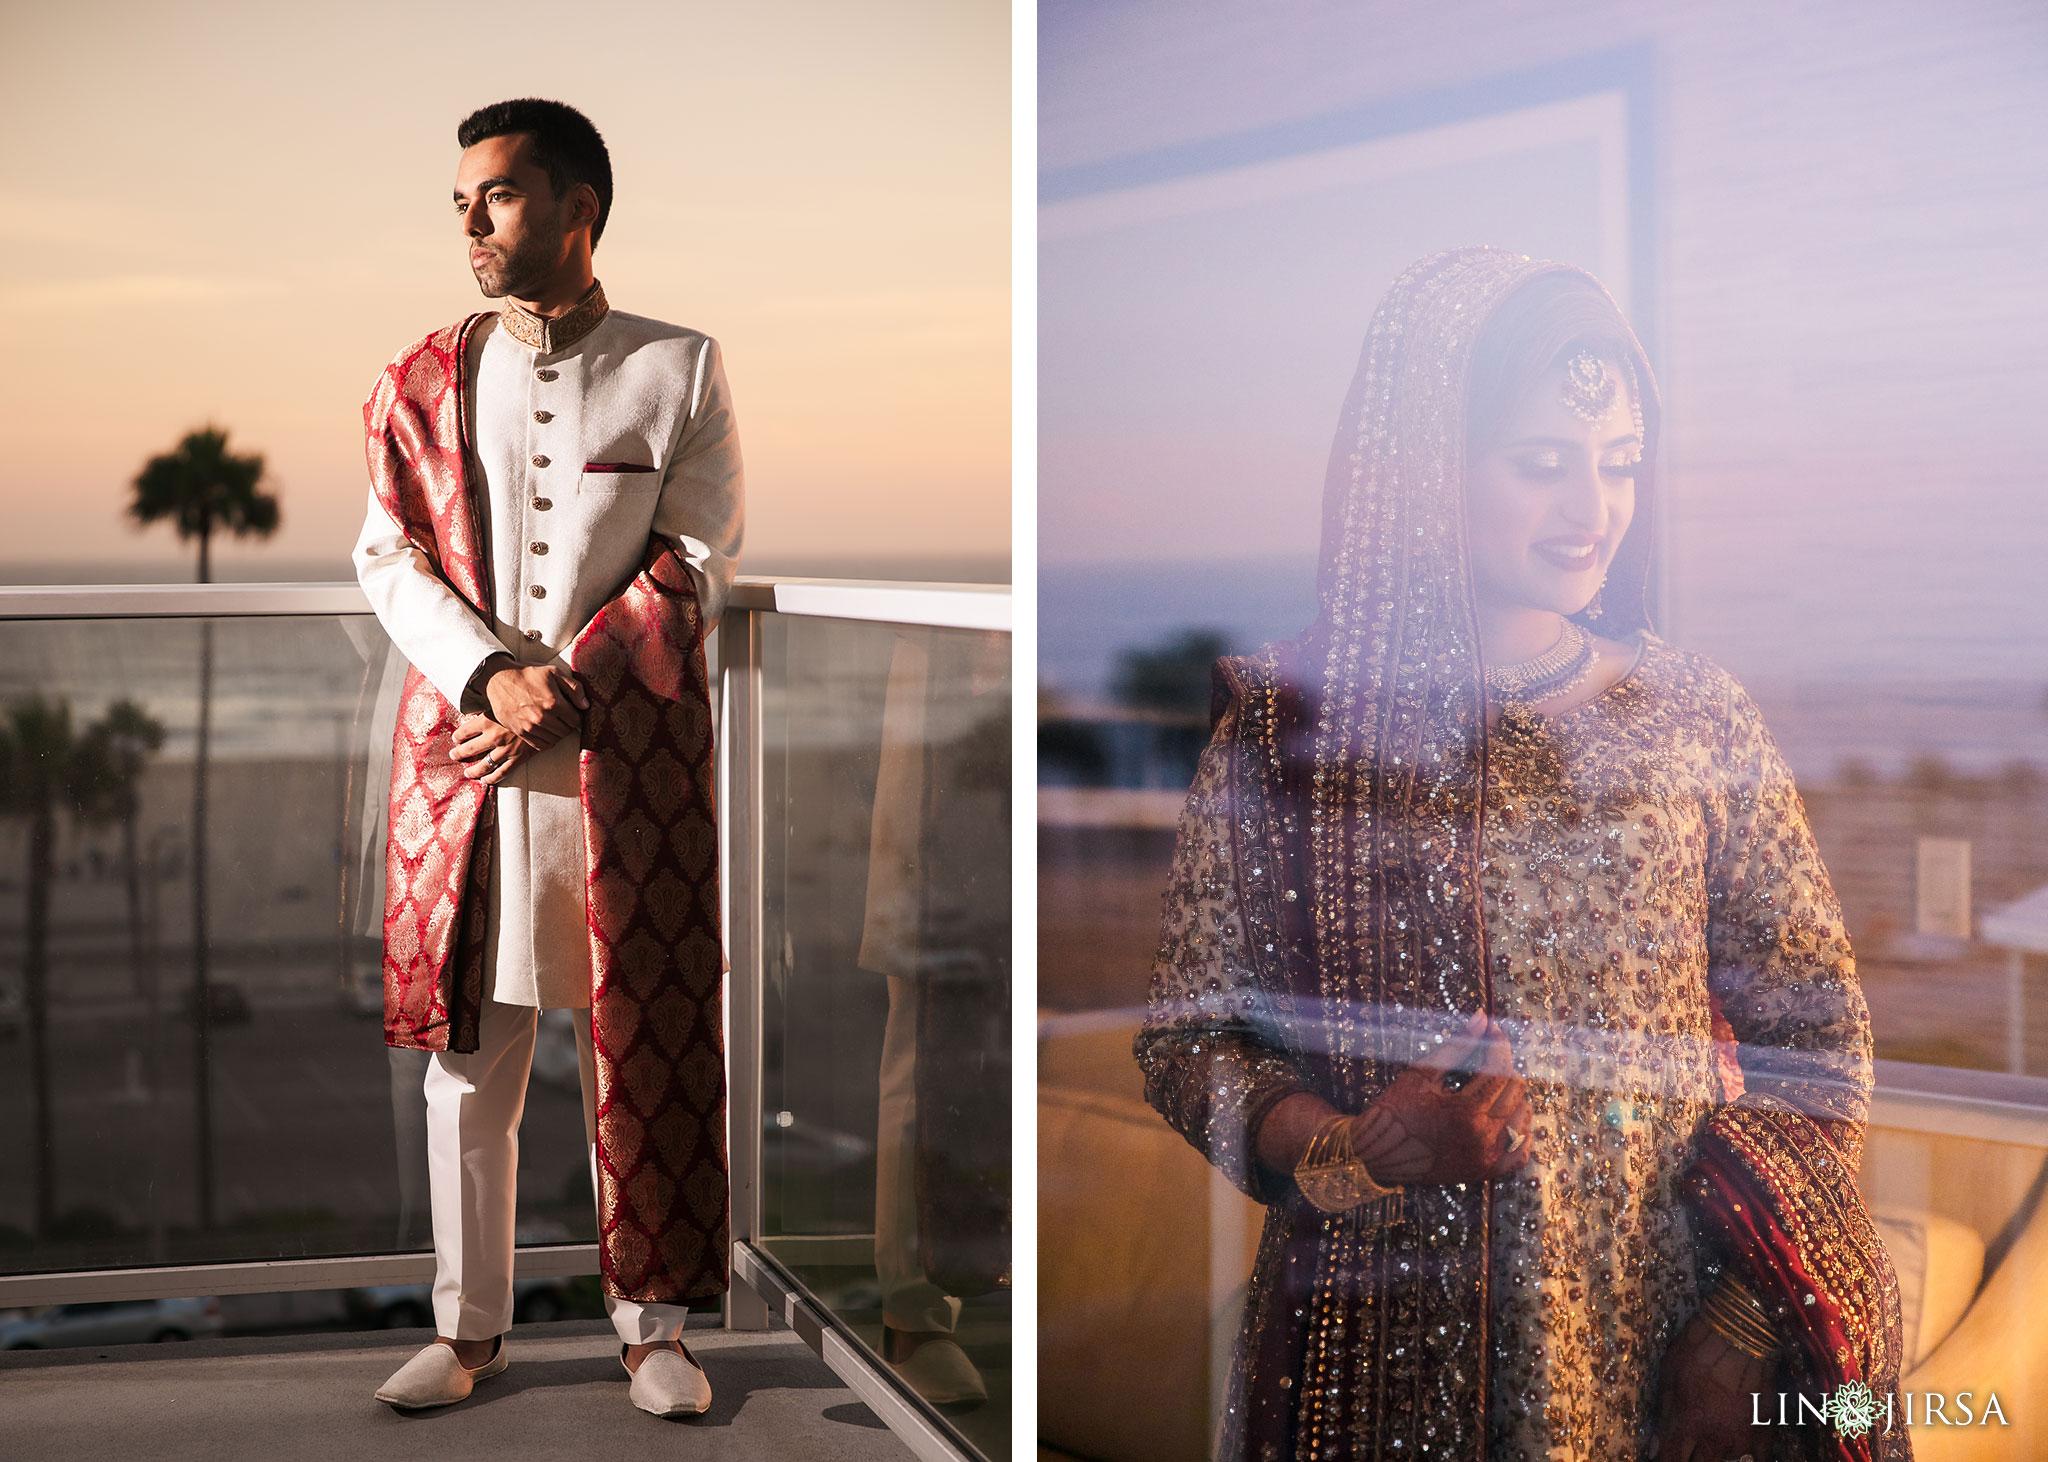 029 pasea hotel huntington beach pakistani muslim wedding photography